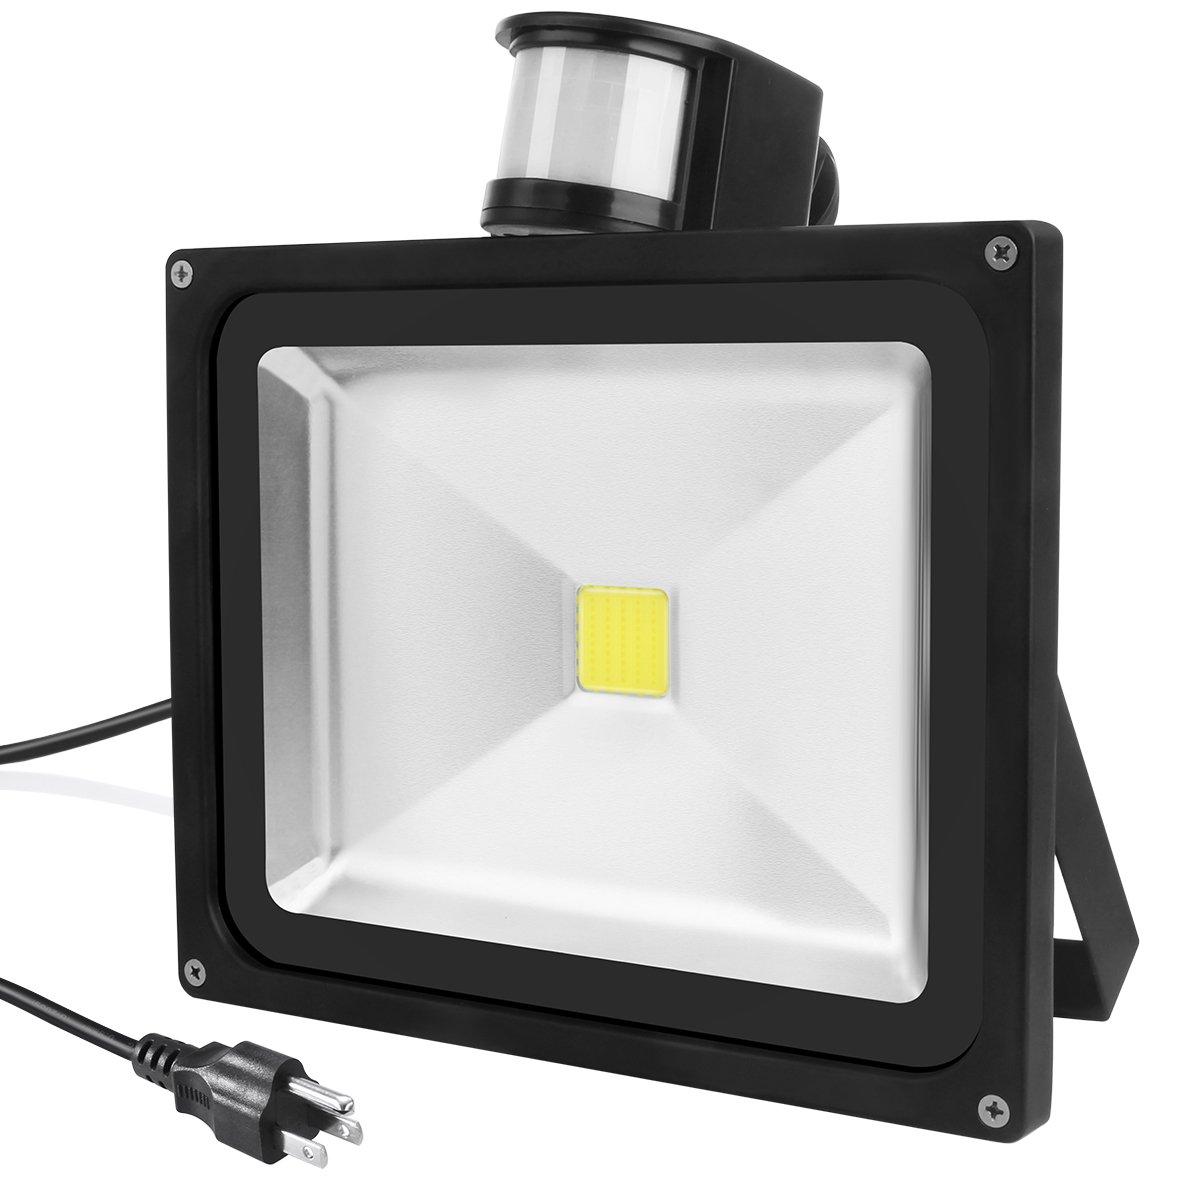 wall security powered lighting led solar innogear lights reviews sensor night light motion best outdoor